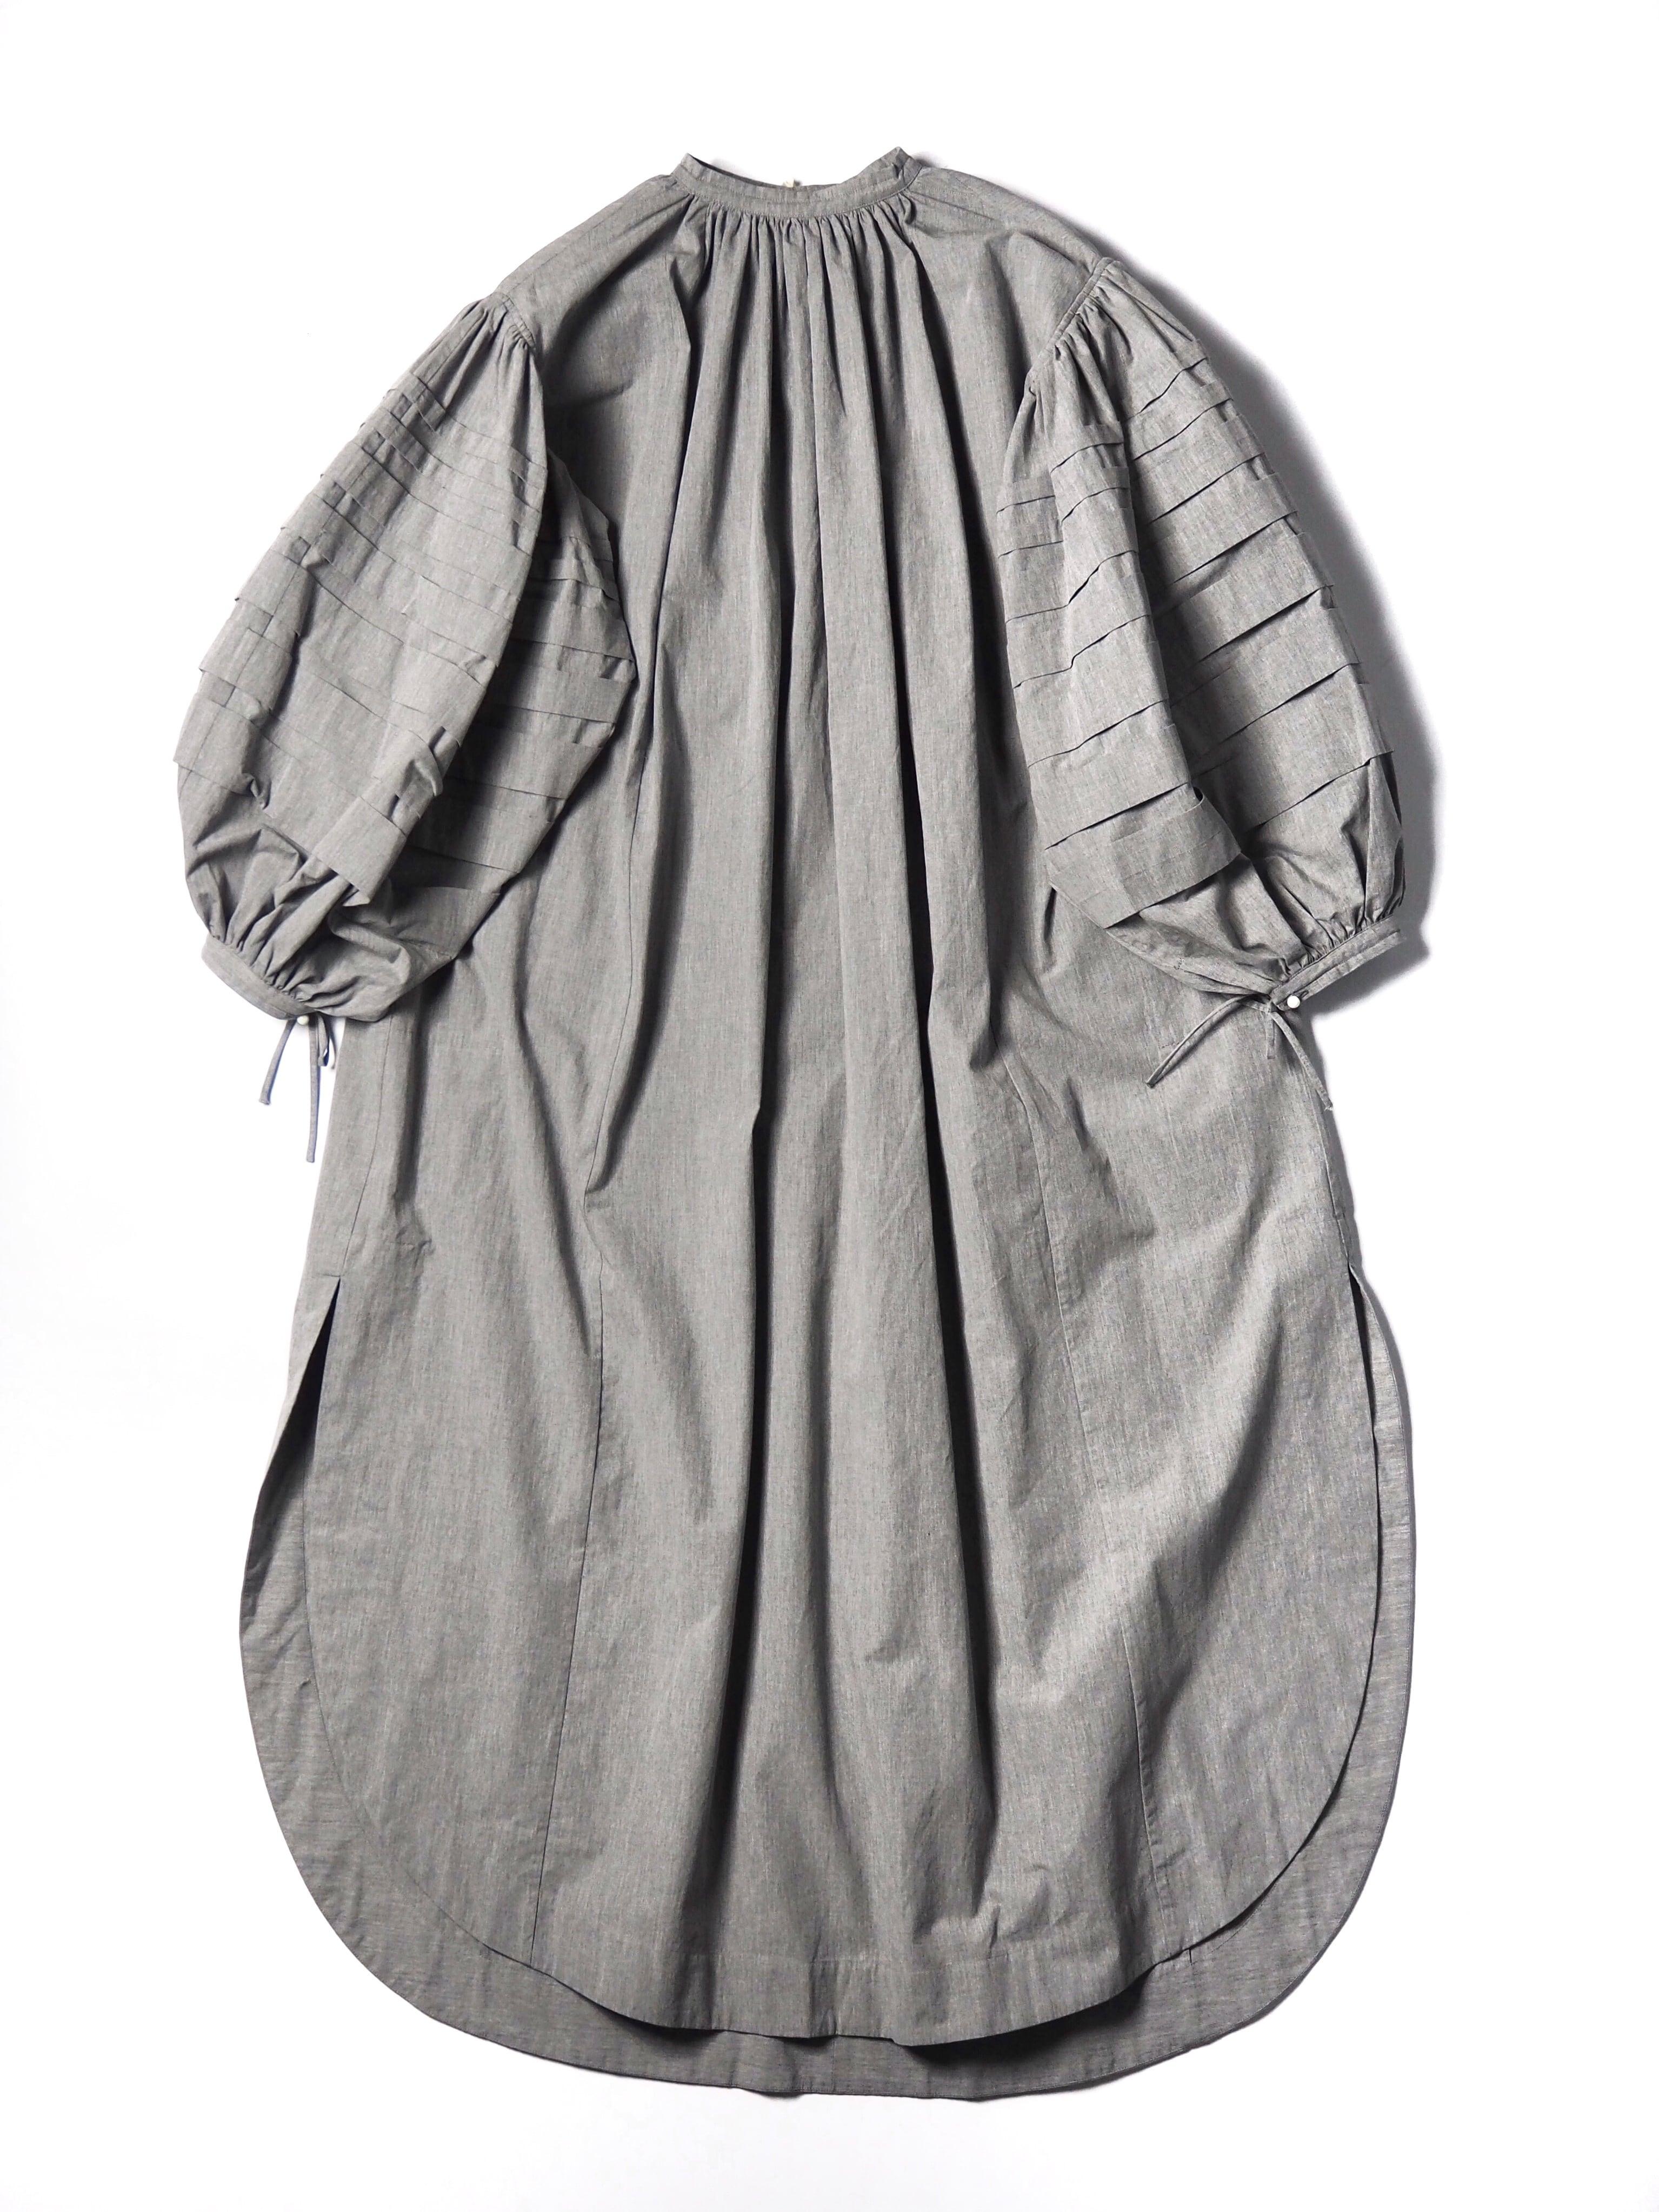 【WRYHT】CHO-CHIN SLEEVE FOLK DRESS